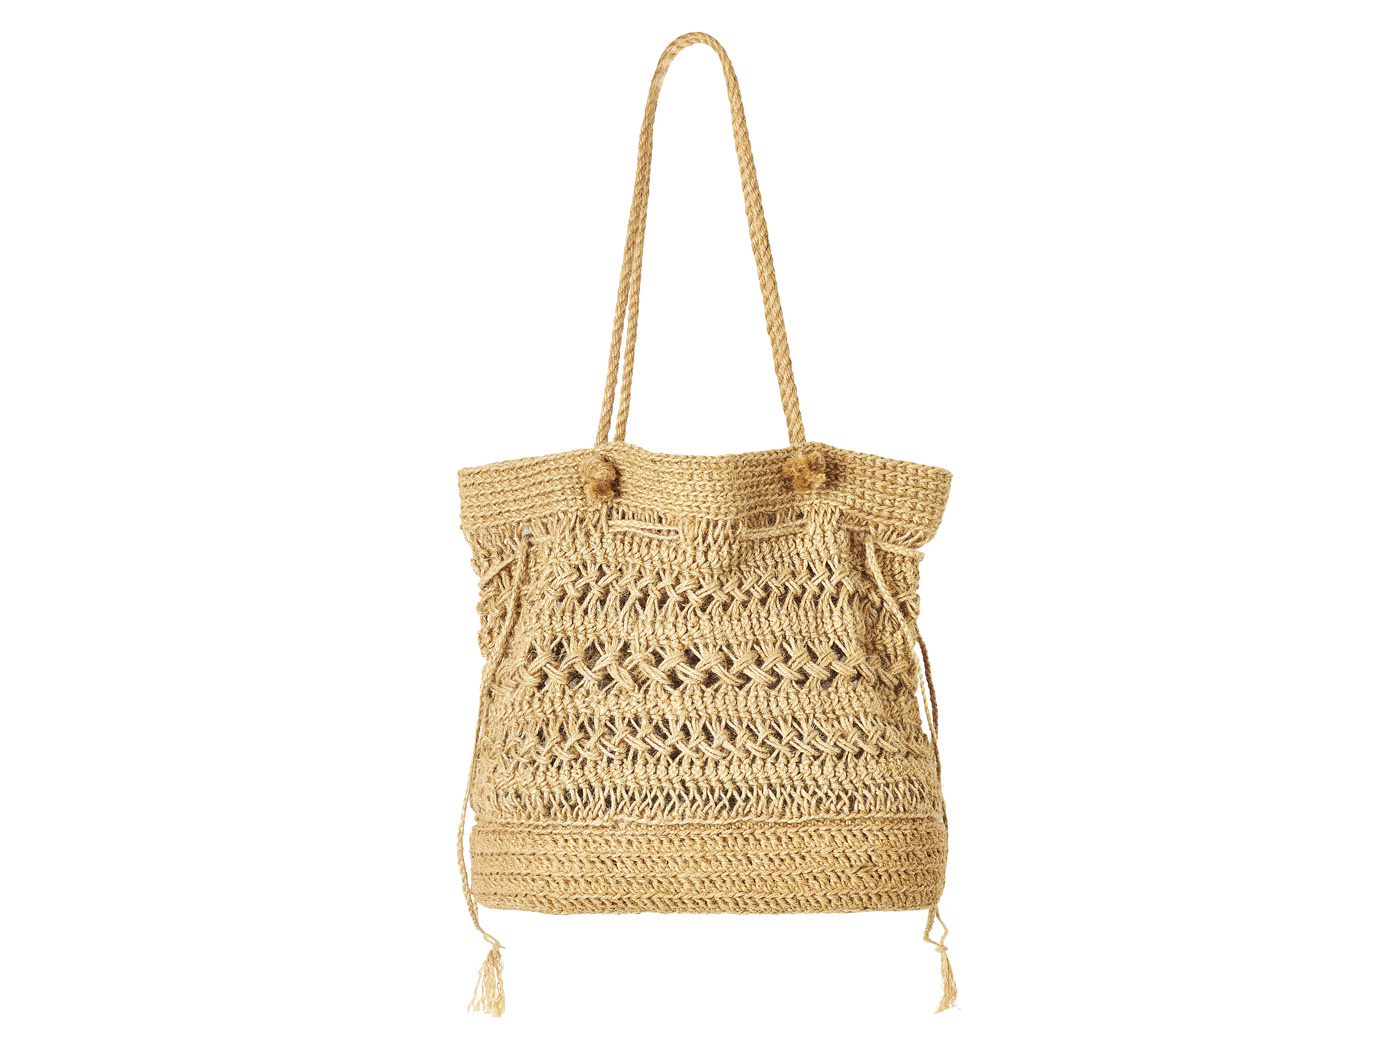 Golovina-fleur-knitted-bag-natural-1